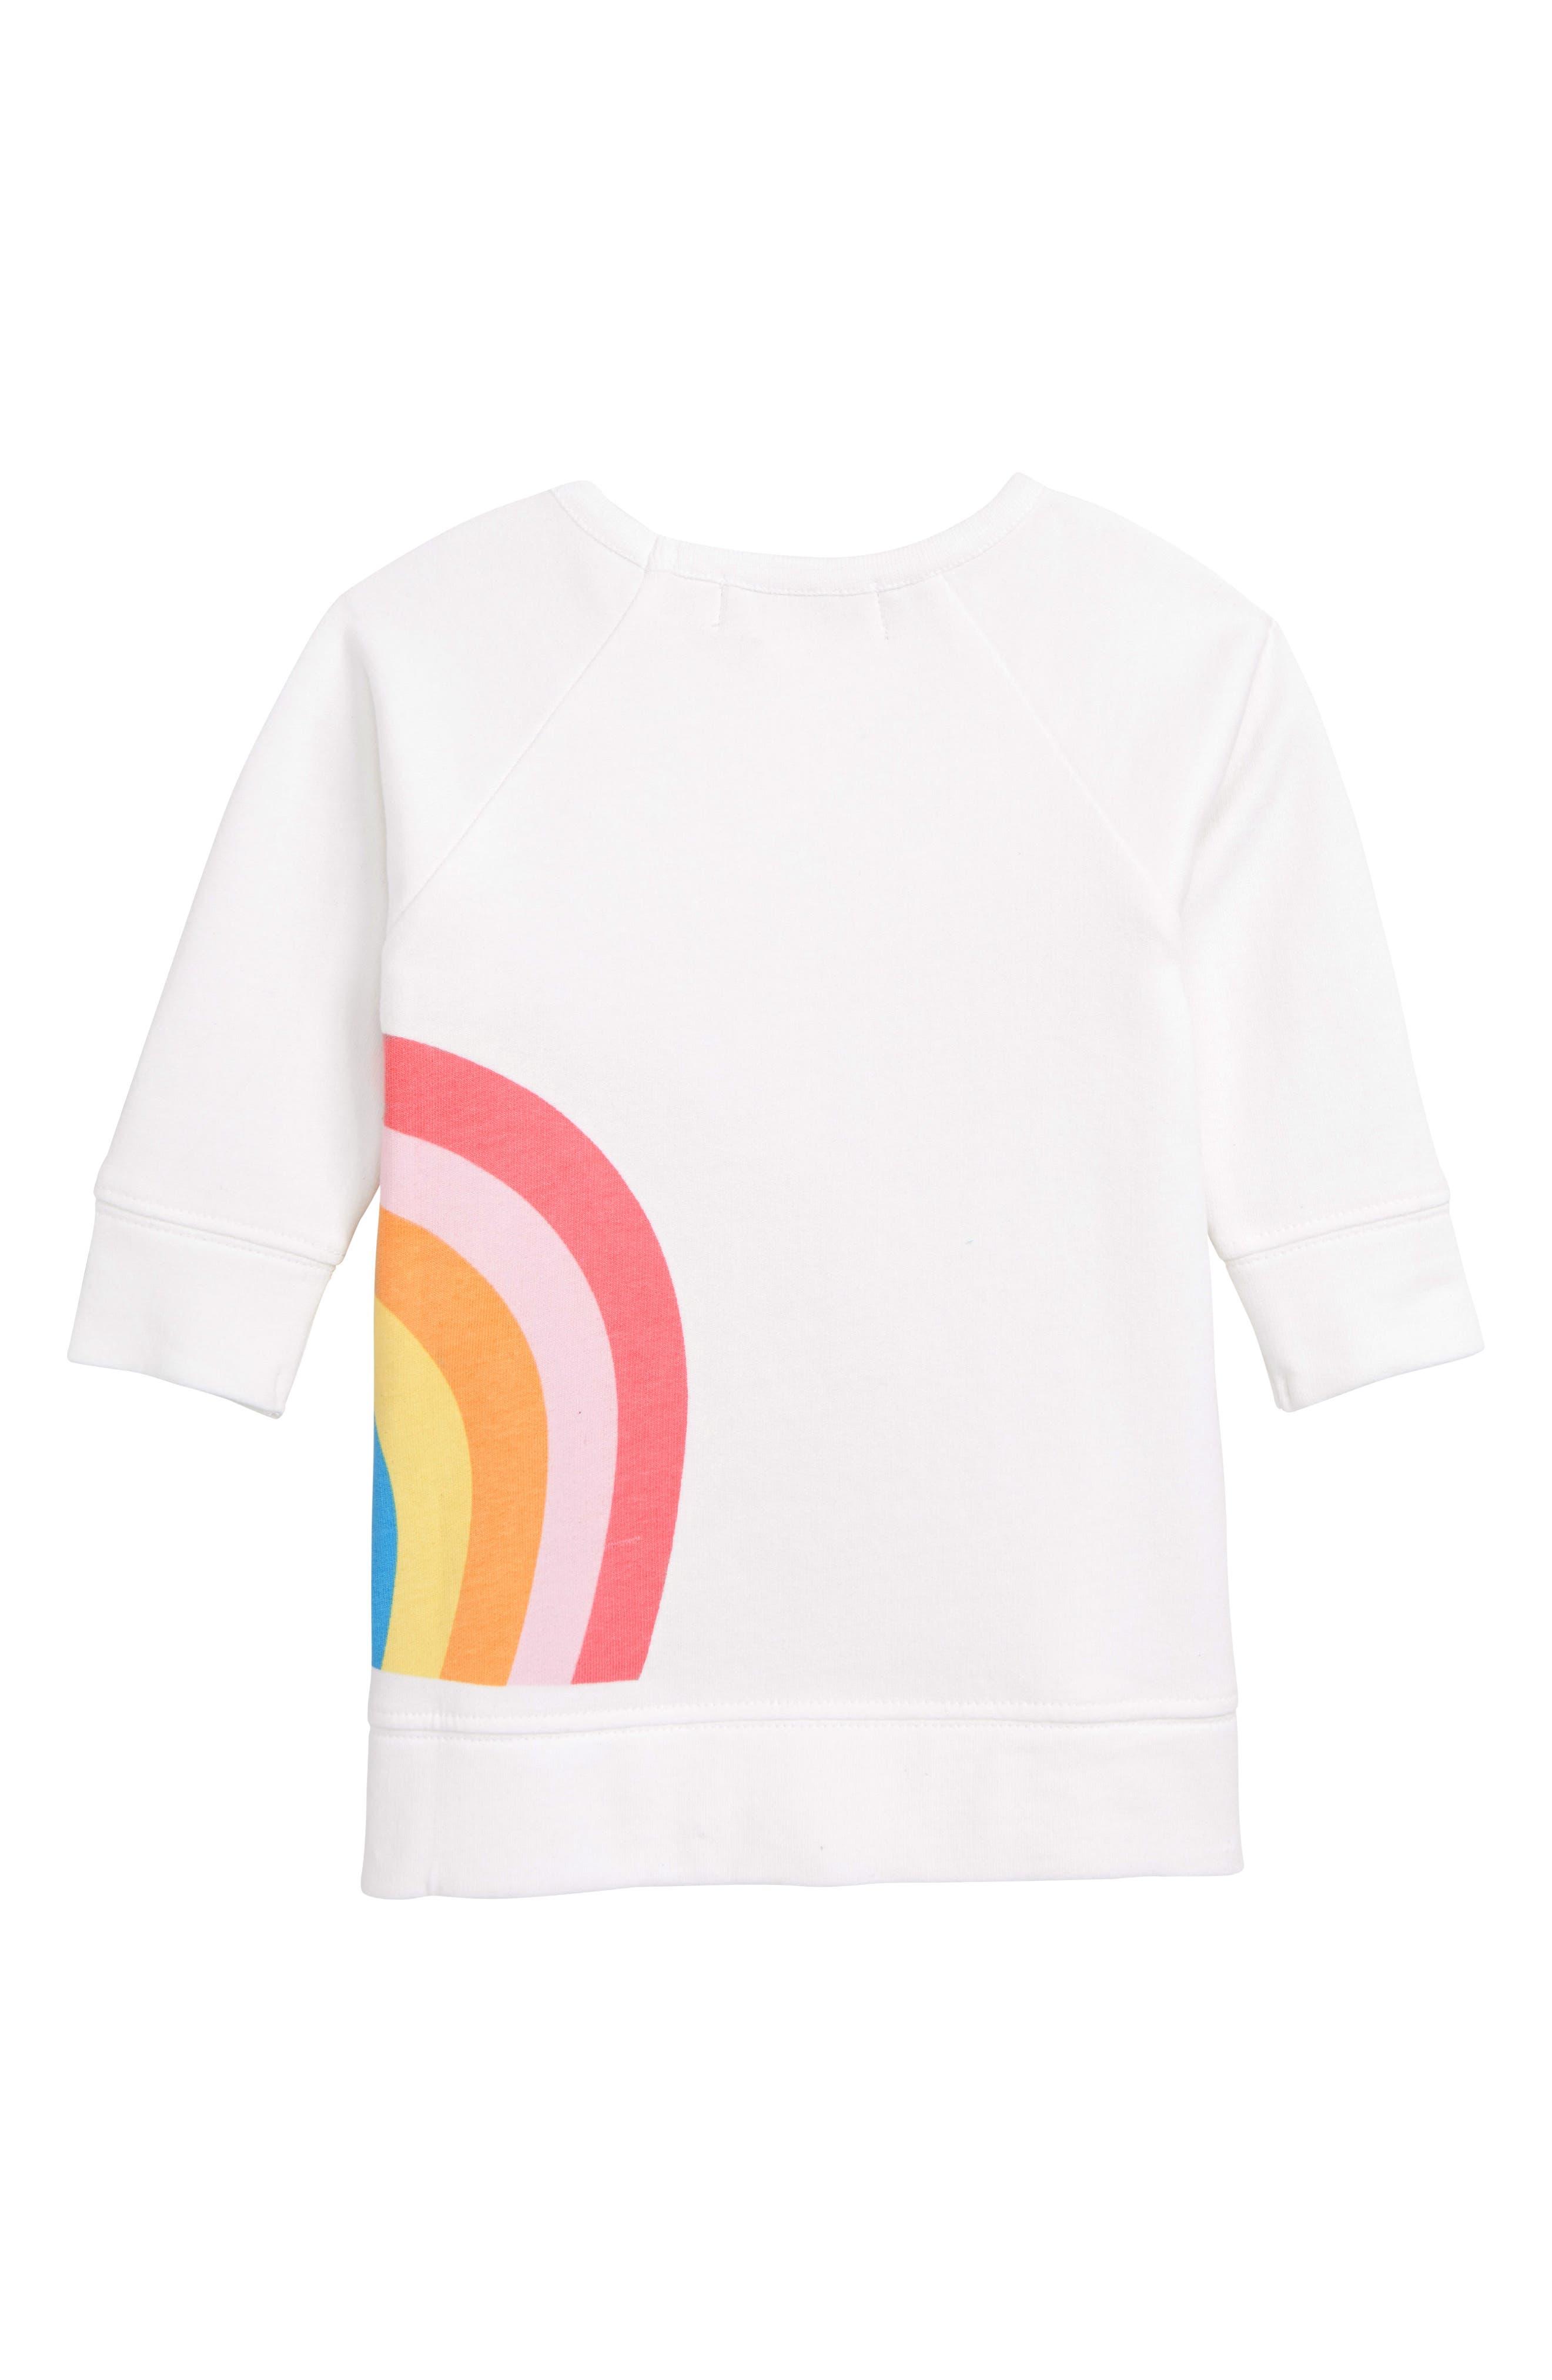 MONICA + ANDY, Varsity Sweatshirt Dress, Alternate thumbnail 2, color, 100